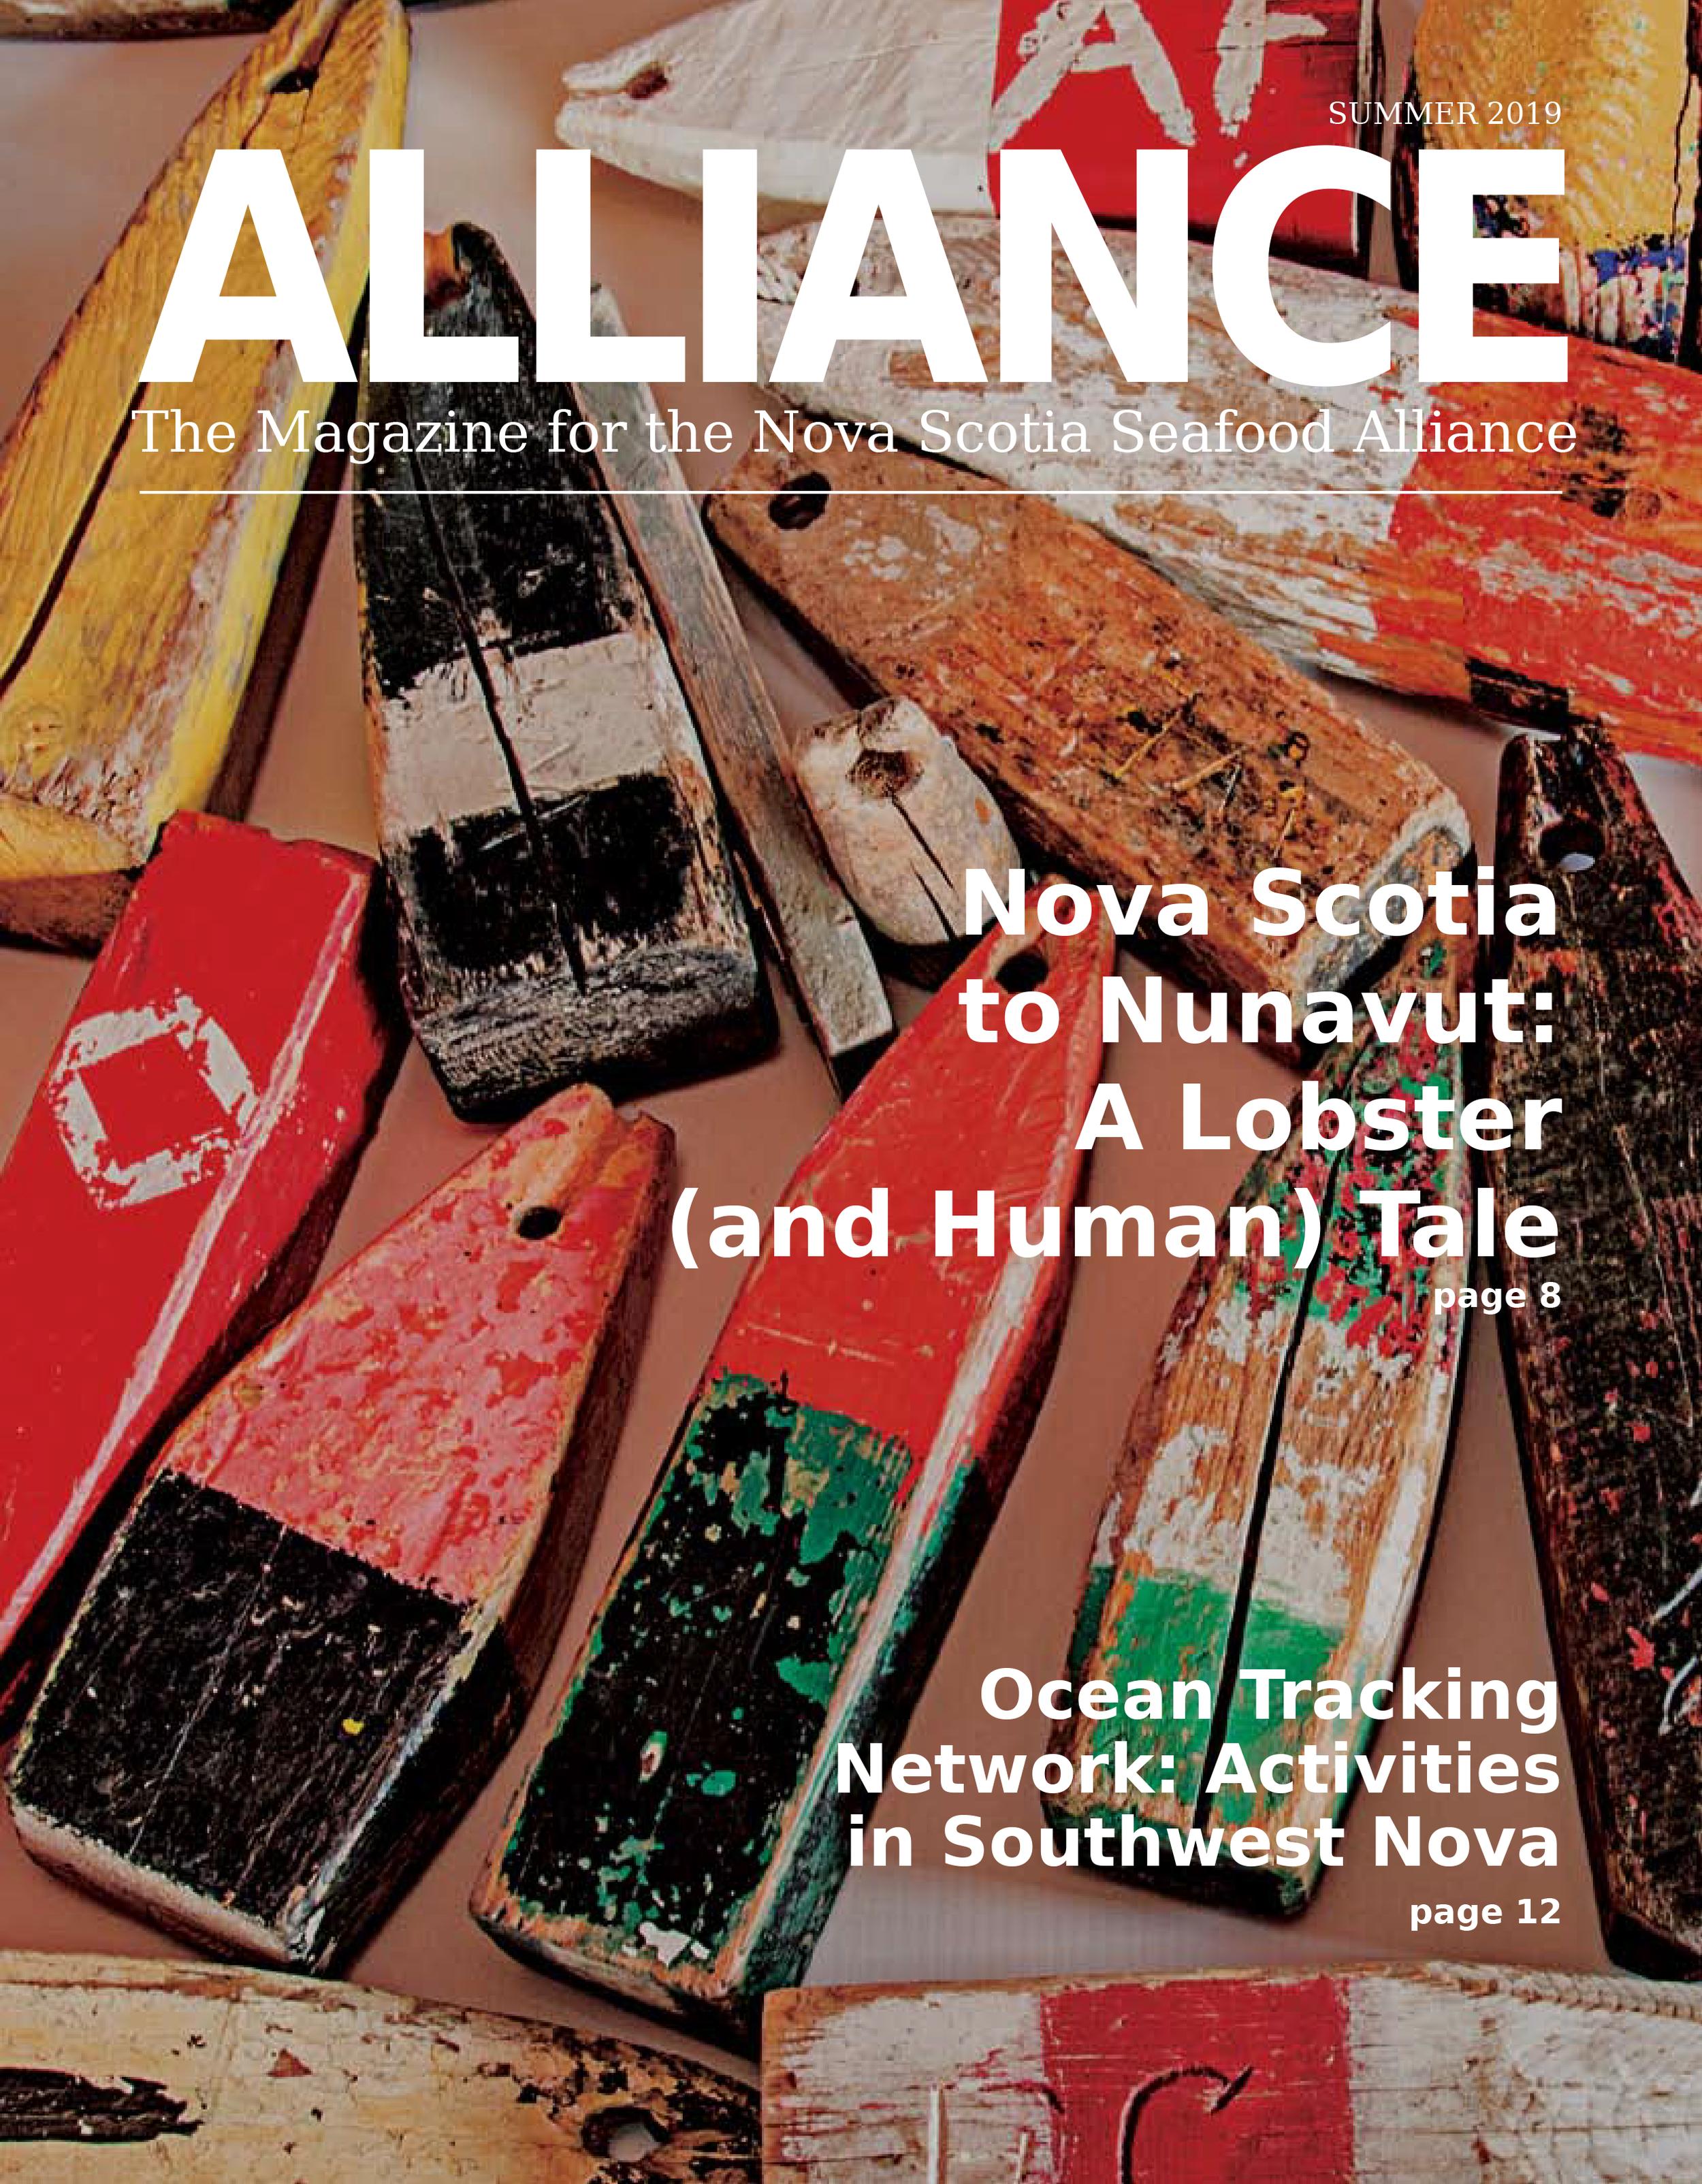 ALLIANCE Magazine summer 2019-1.png